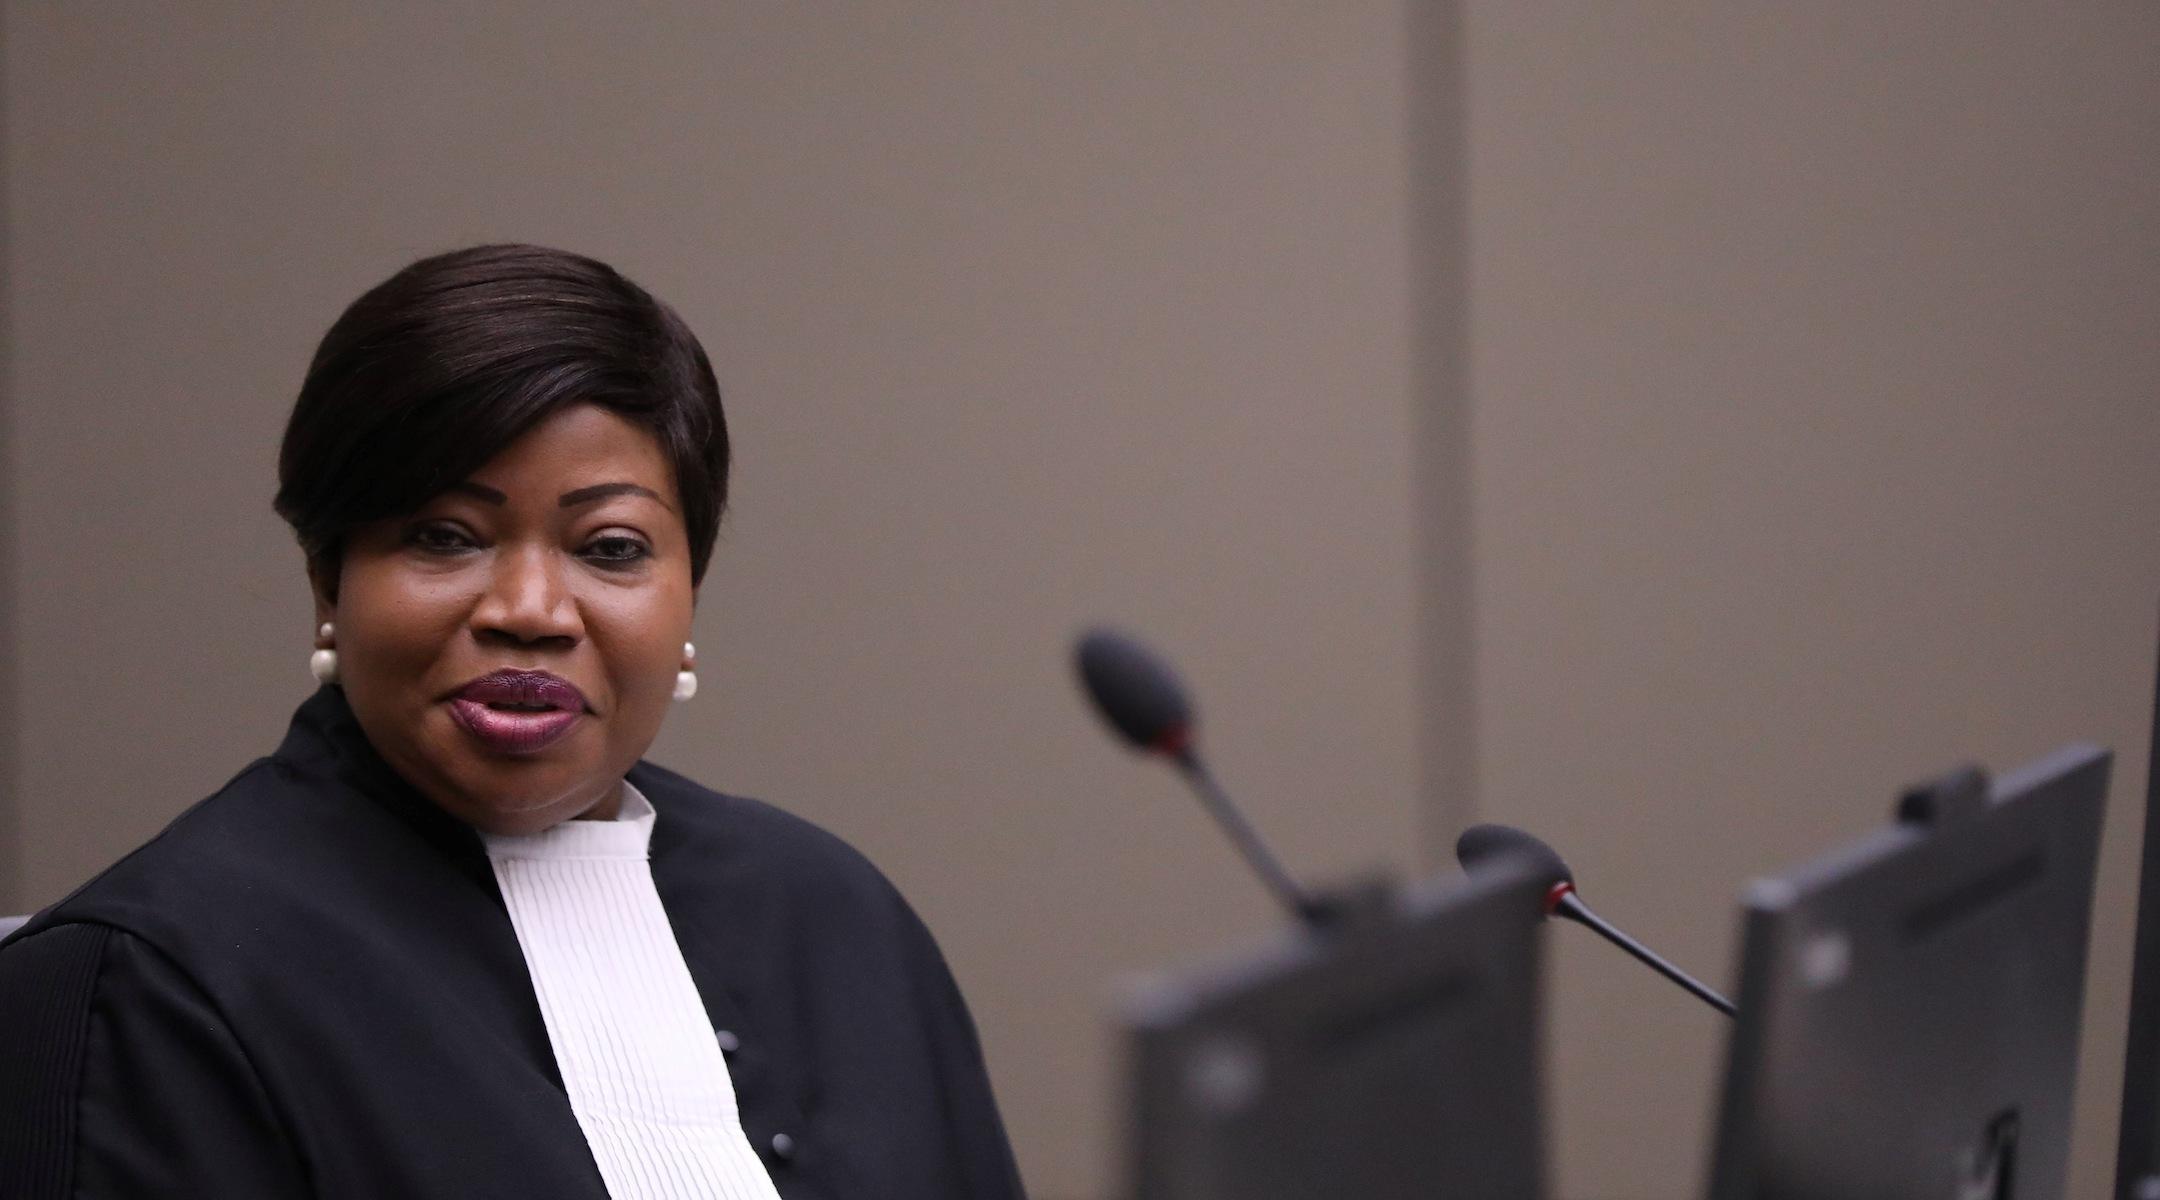 International Criminal Court prosecutor Fatou Bensouda at the court in The Hague, Netherlands, July 8, 2019. (Photo/JTA-Eva Plevier-AFP via Getty Images)